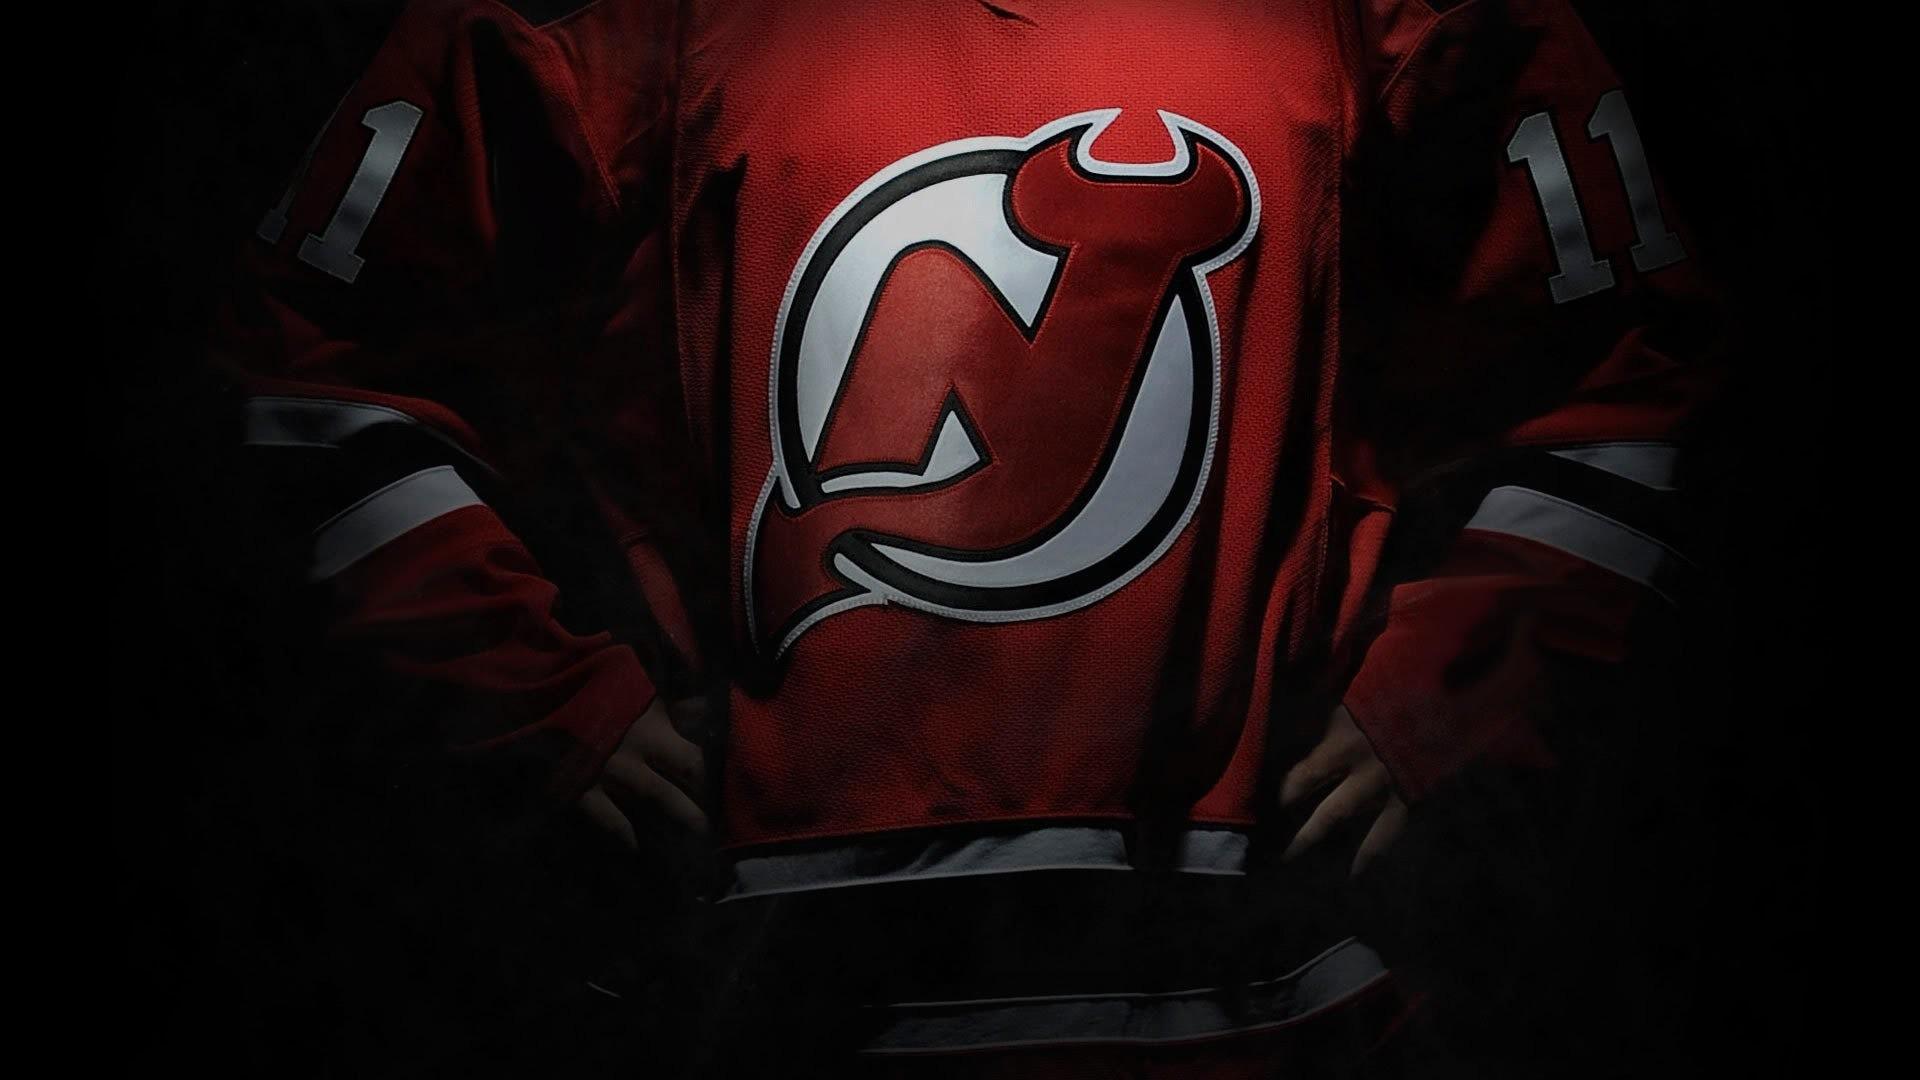 new jersey devils wallpaper ·①